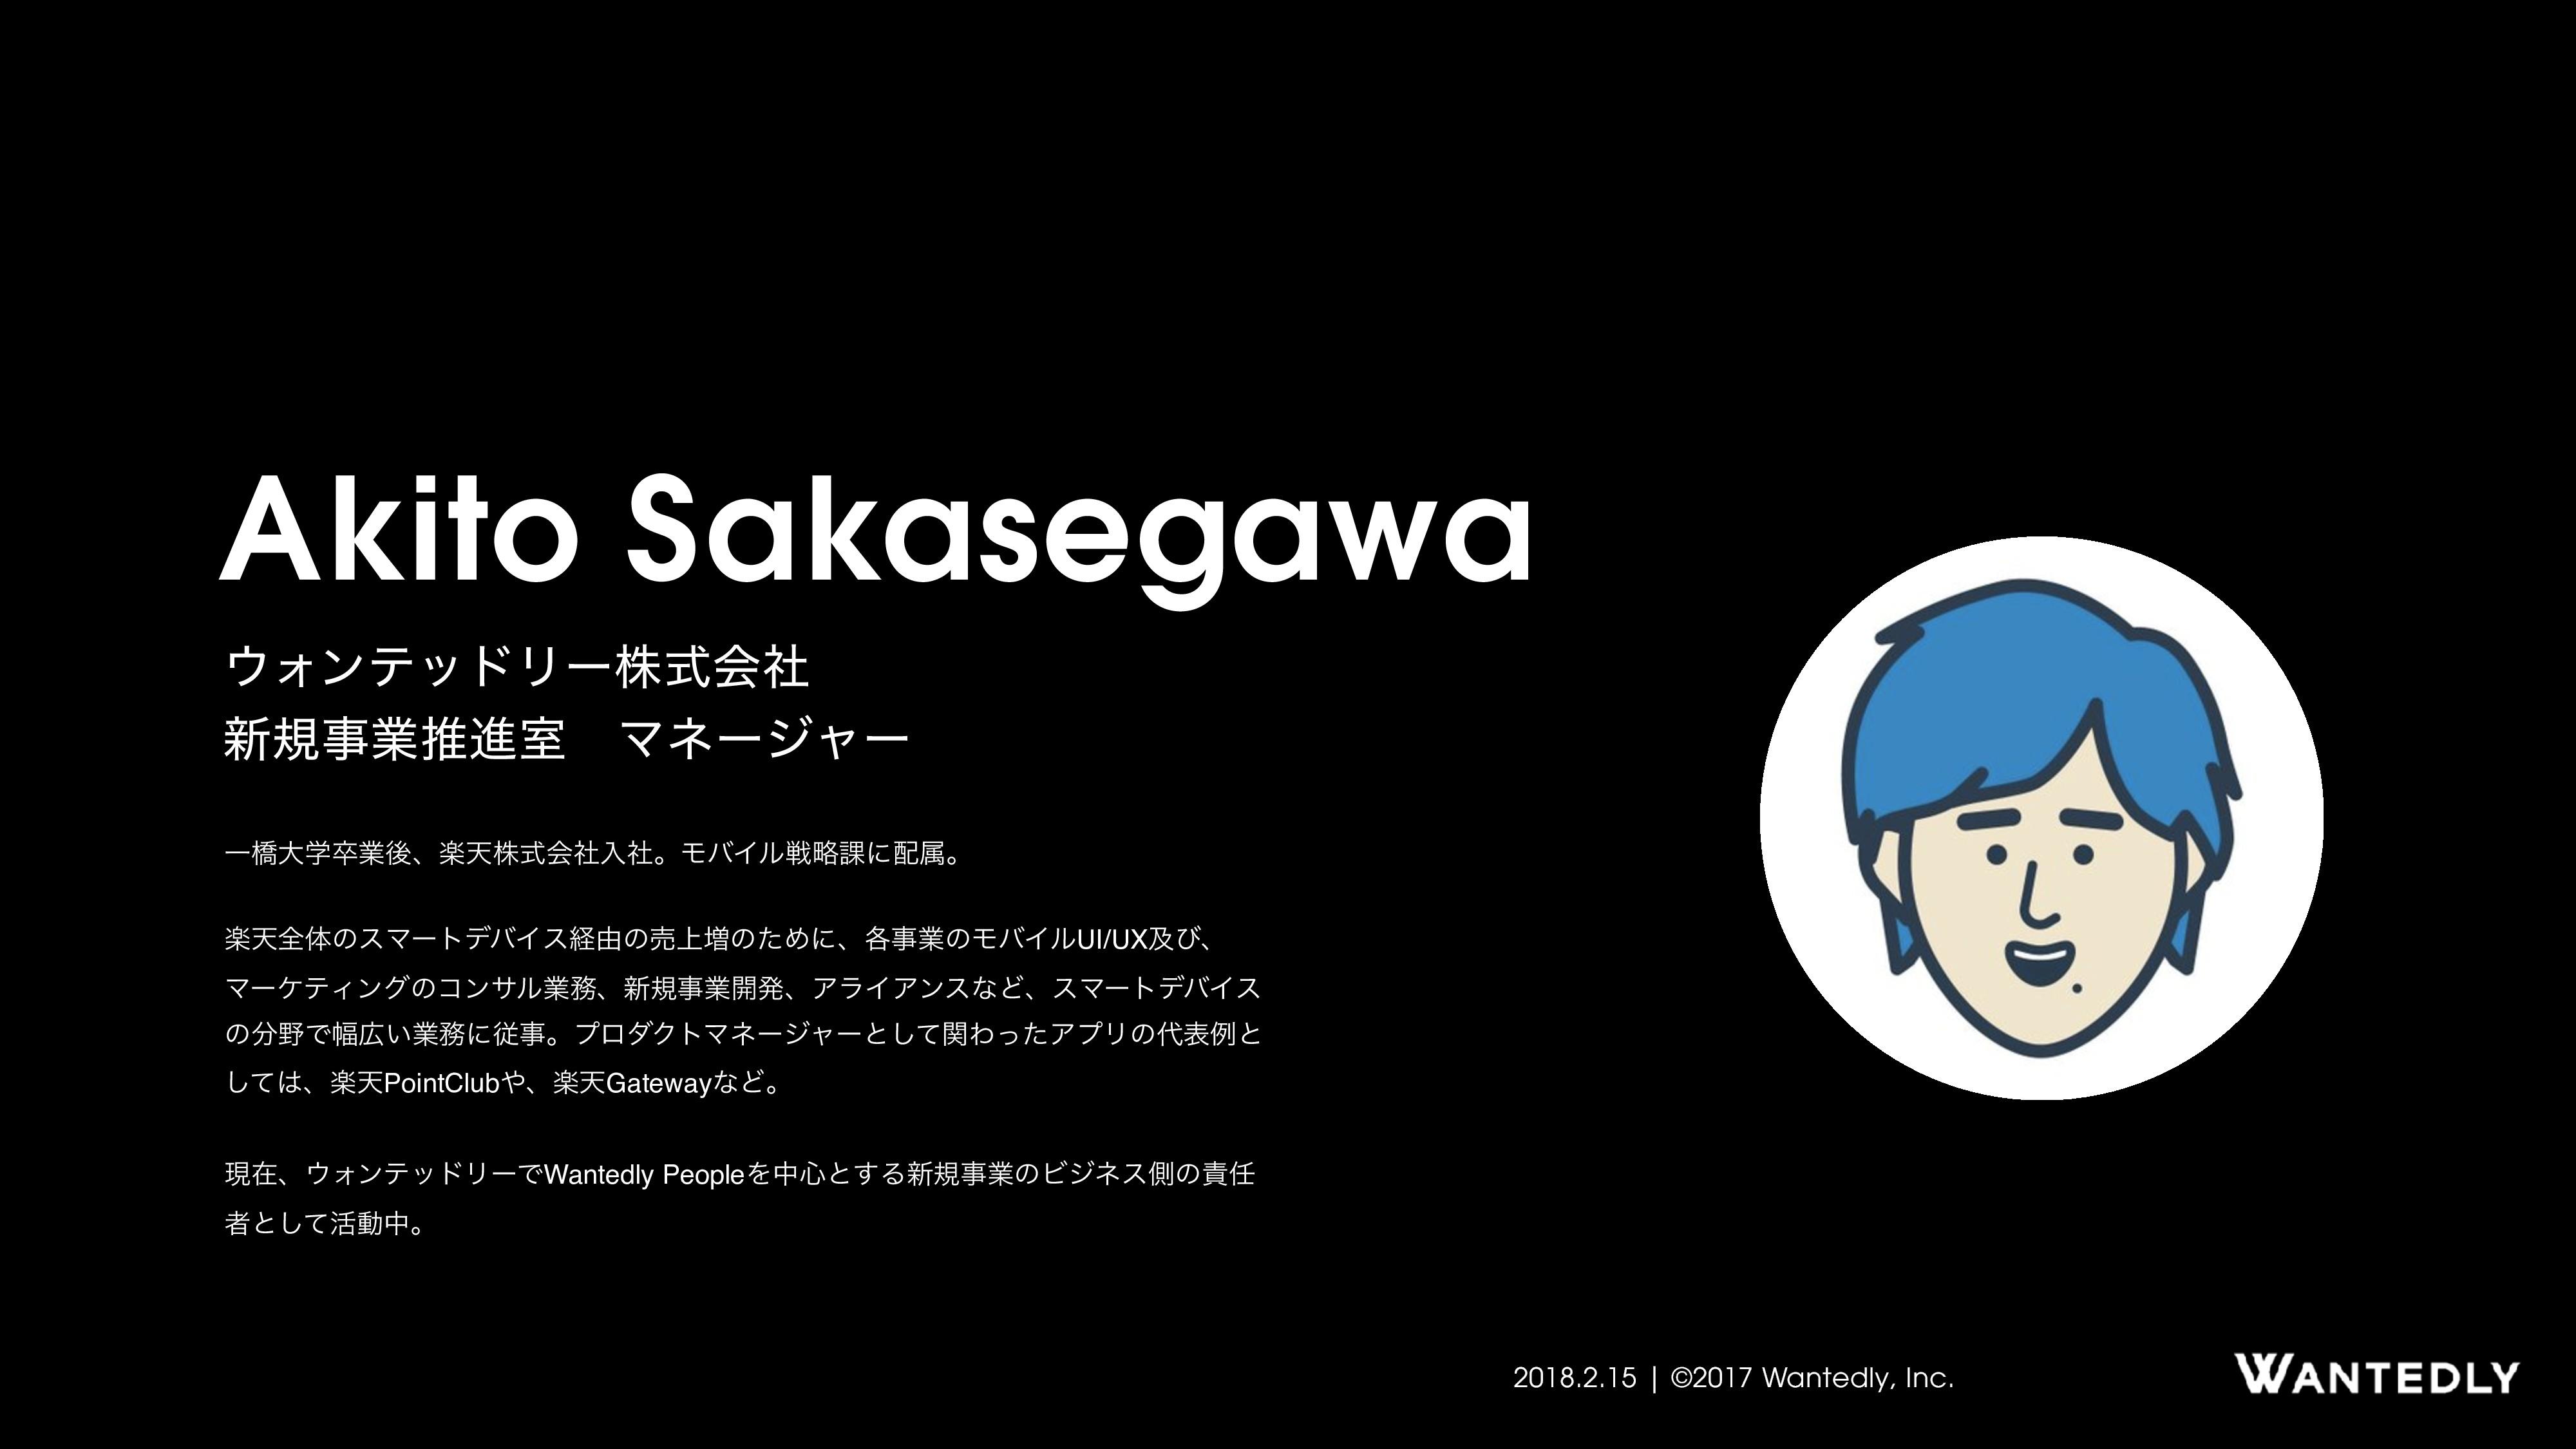 Akito Sakasegawa ΥϯςουϦʔגࣜձࣾ ৽نۀਪਐࣨɹϚωʔδϟʔ Ұڮ...